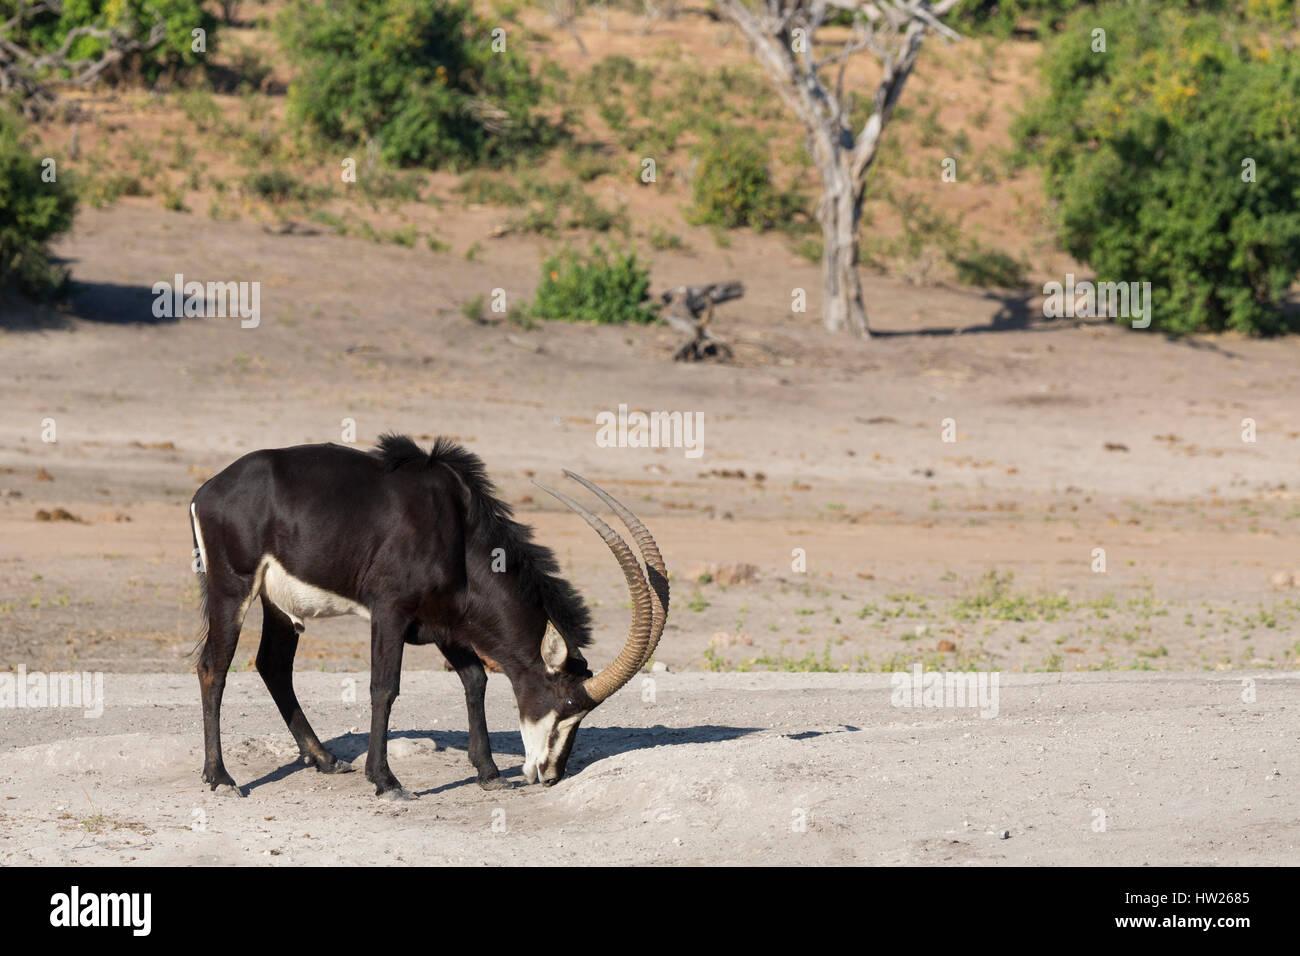 Sable (Hippotragus niger) licking salt, Chobe National Park, Botswana, June 2016 - Stock Image